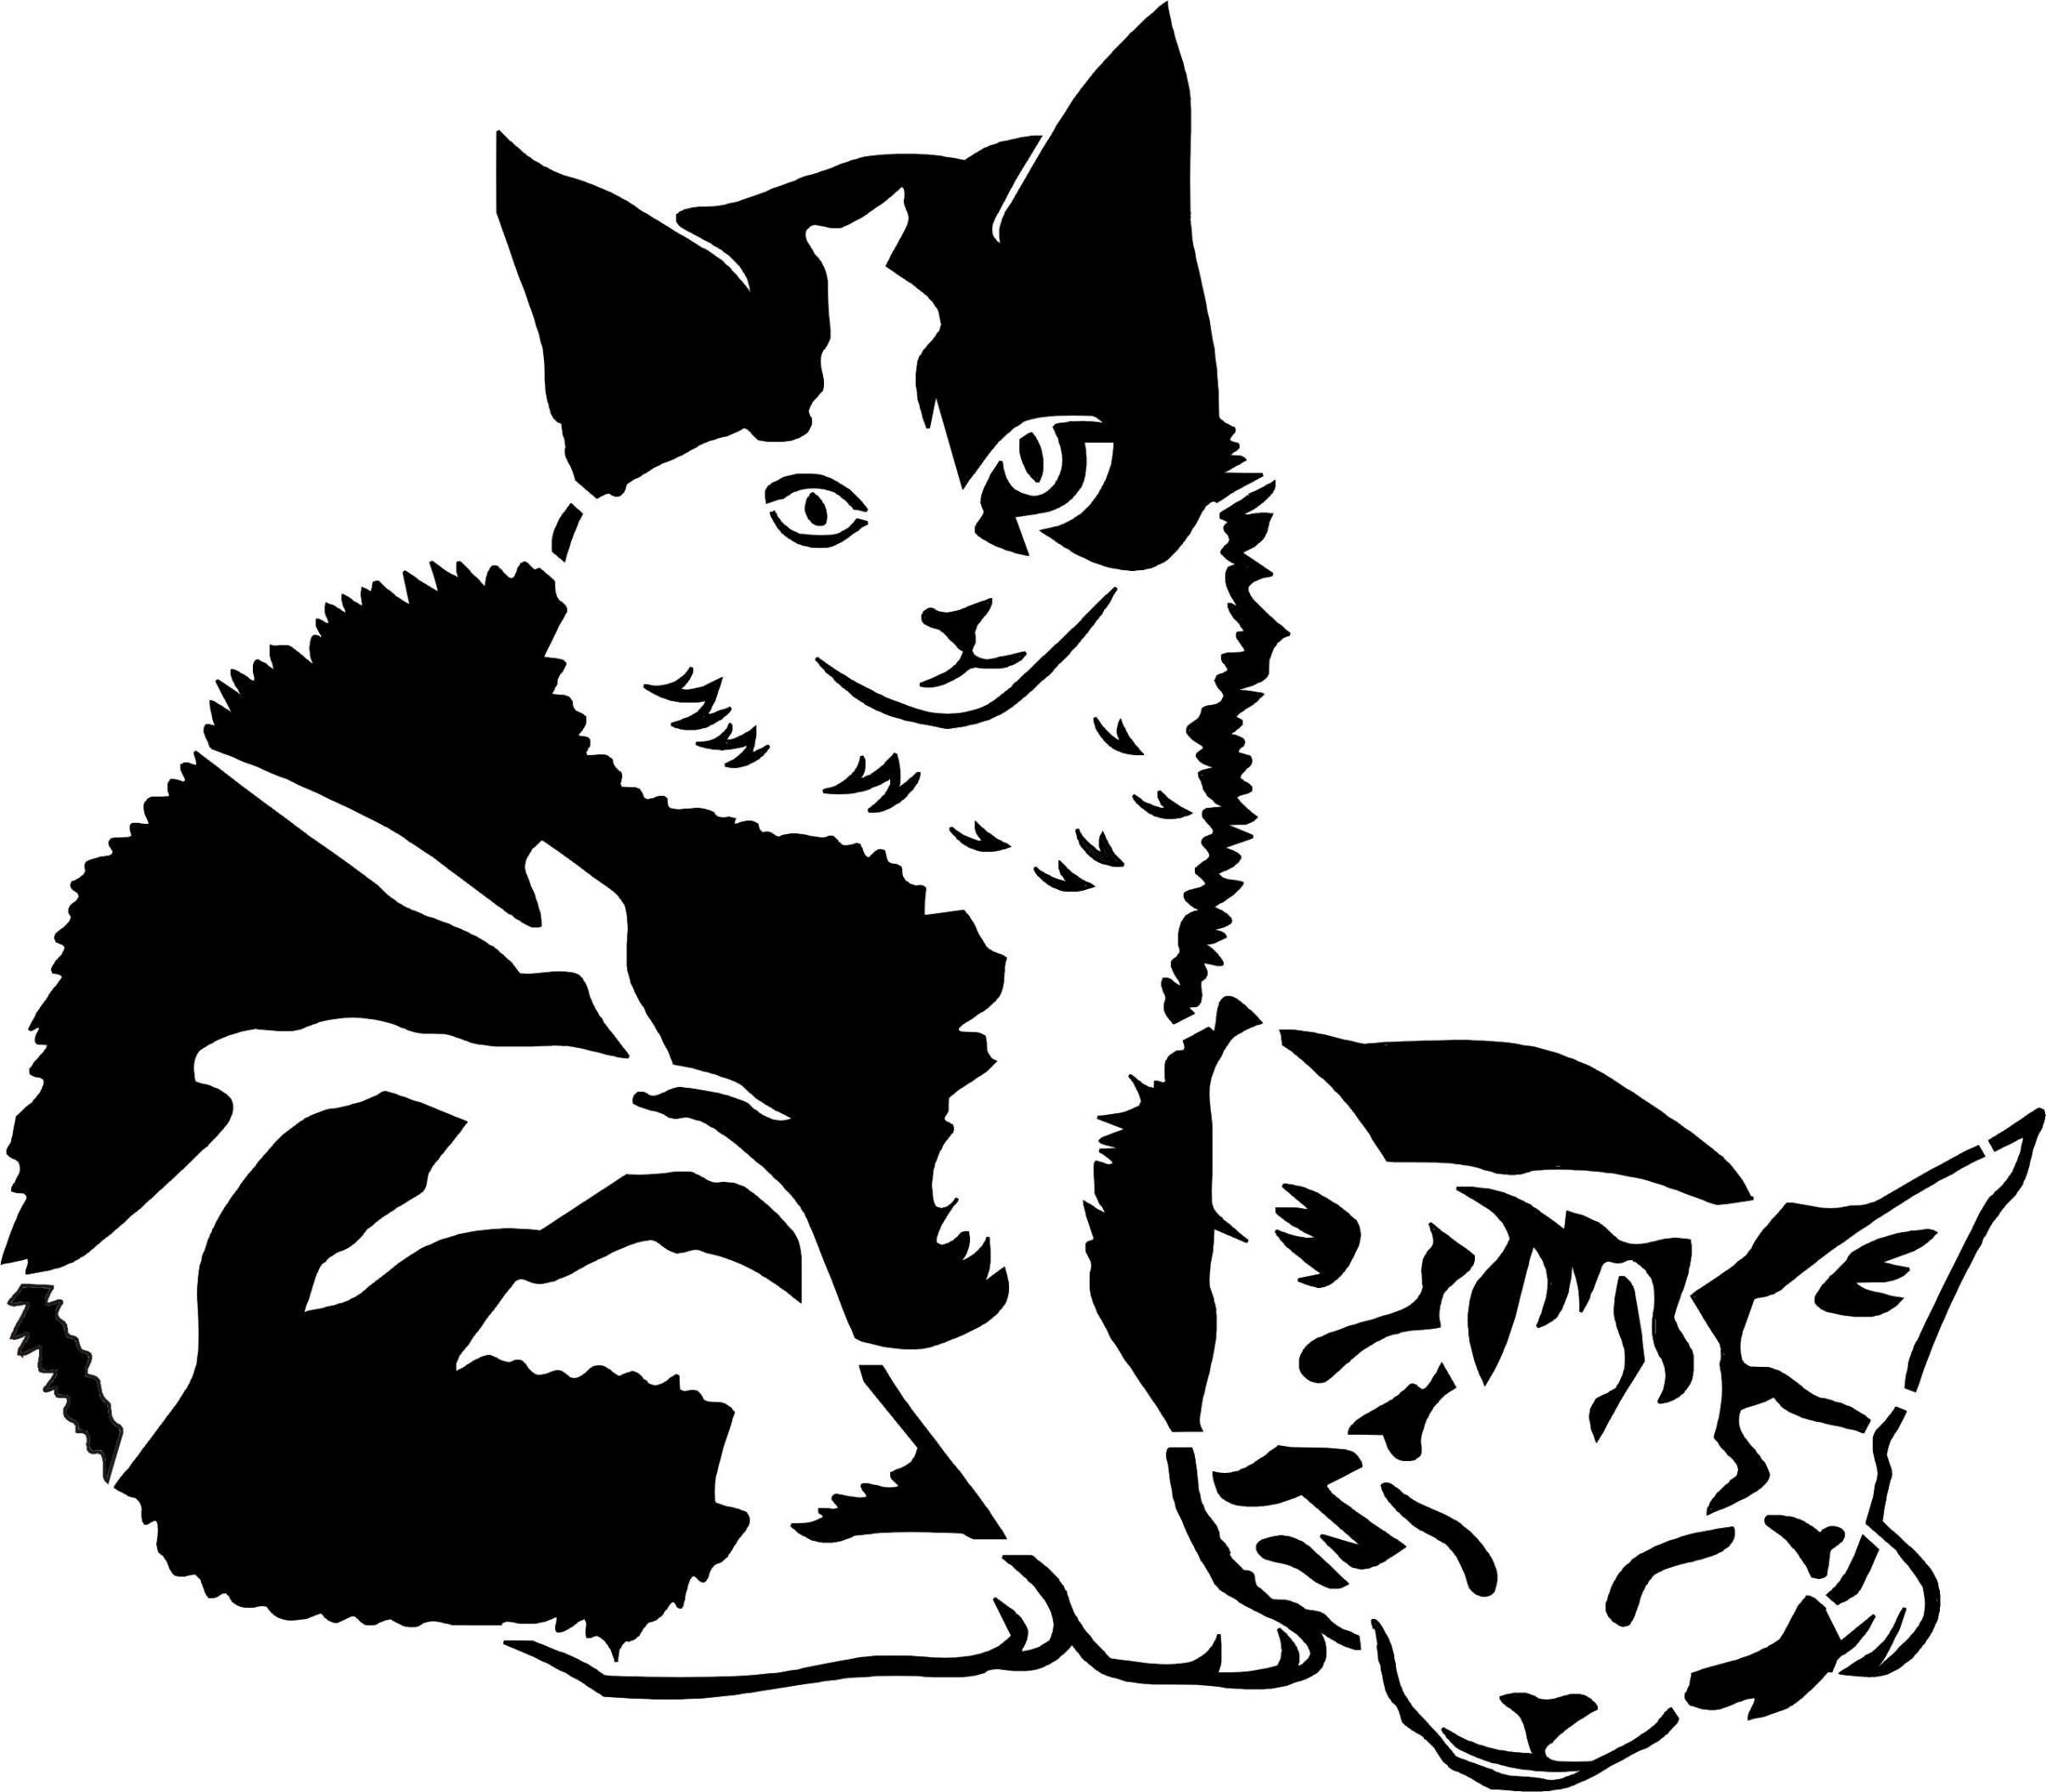 stencil schablone 2 kätzchen | outros | pinterest | tuto aquarelle